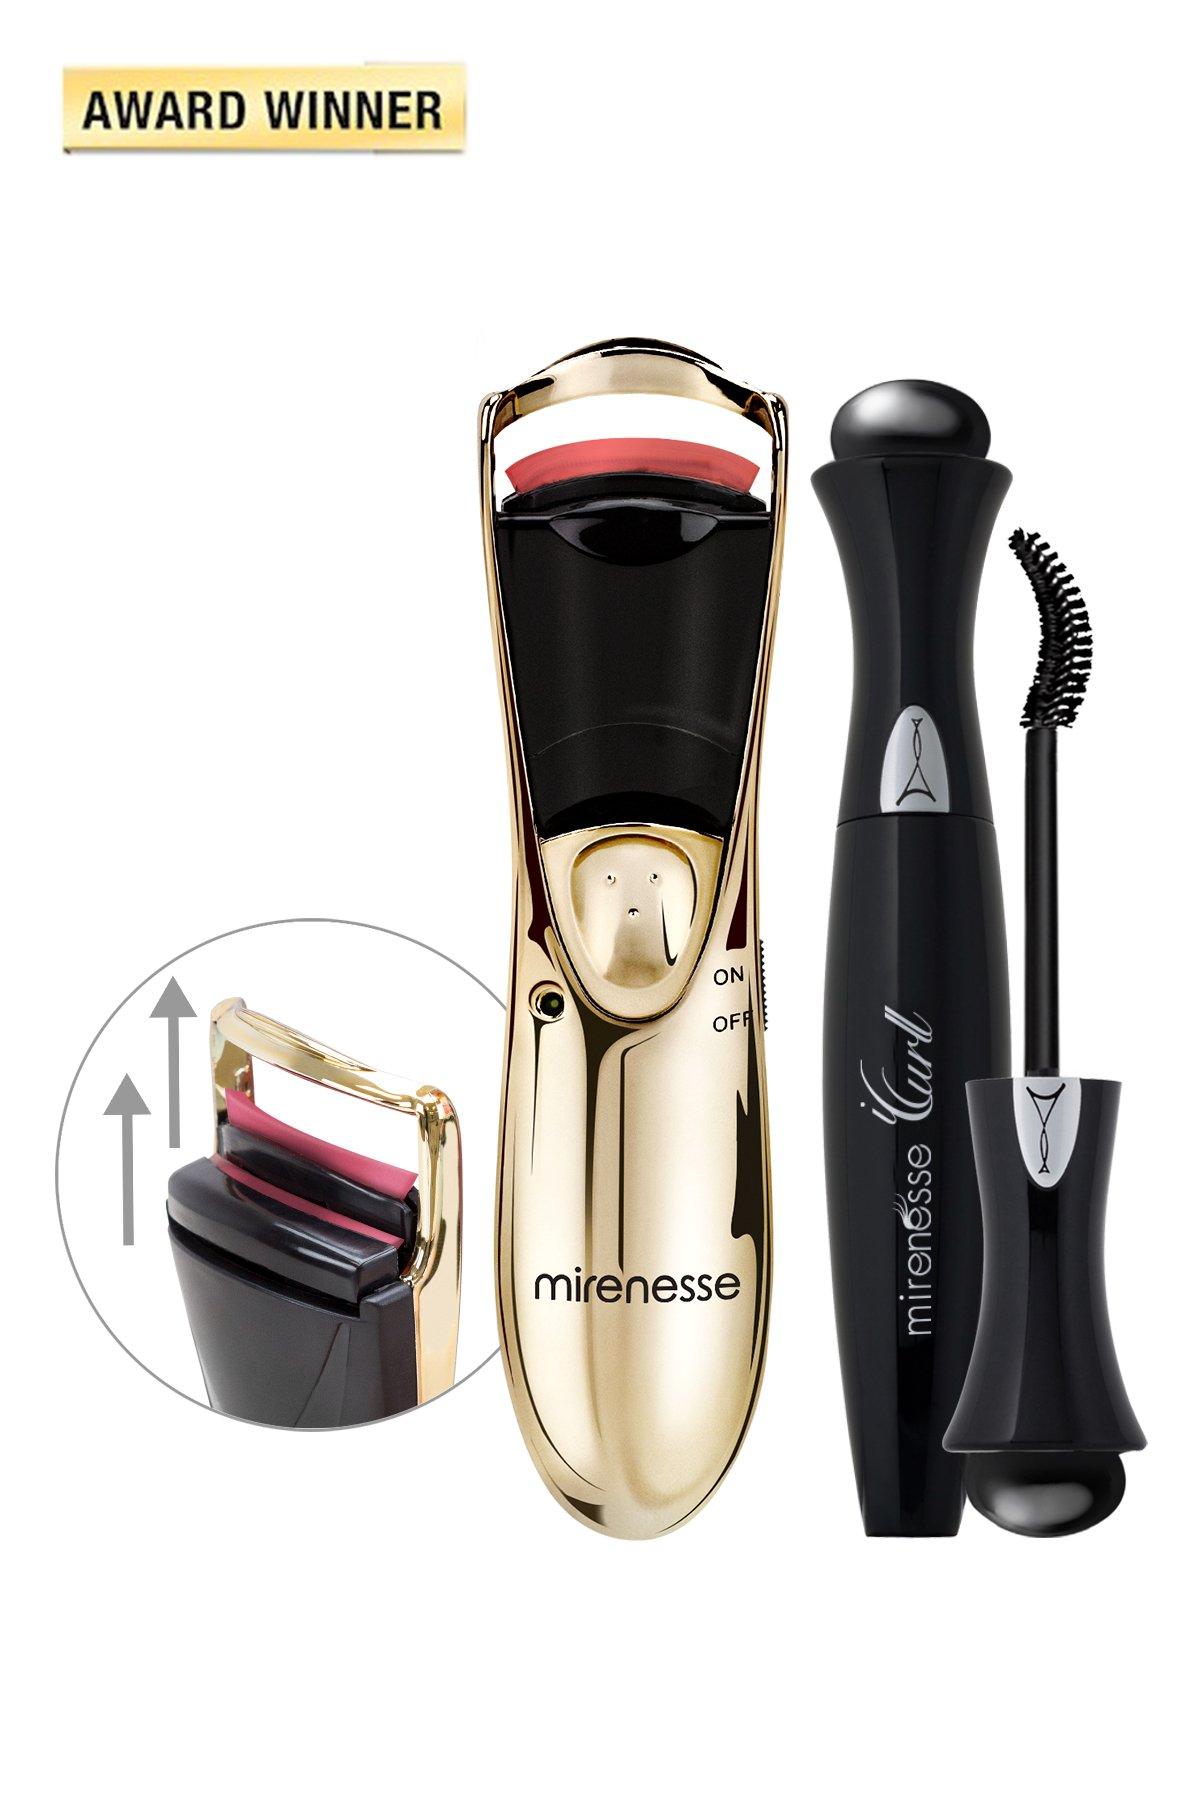 Winner - Best Curler, iCurl Twin Heated Lash Curler+ ICurl Secret Weapon 24hr Mascara- Mirenesse Cosmetics